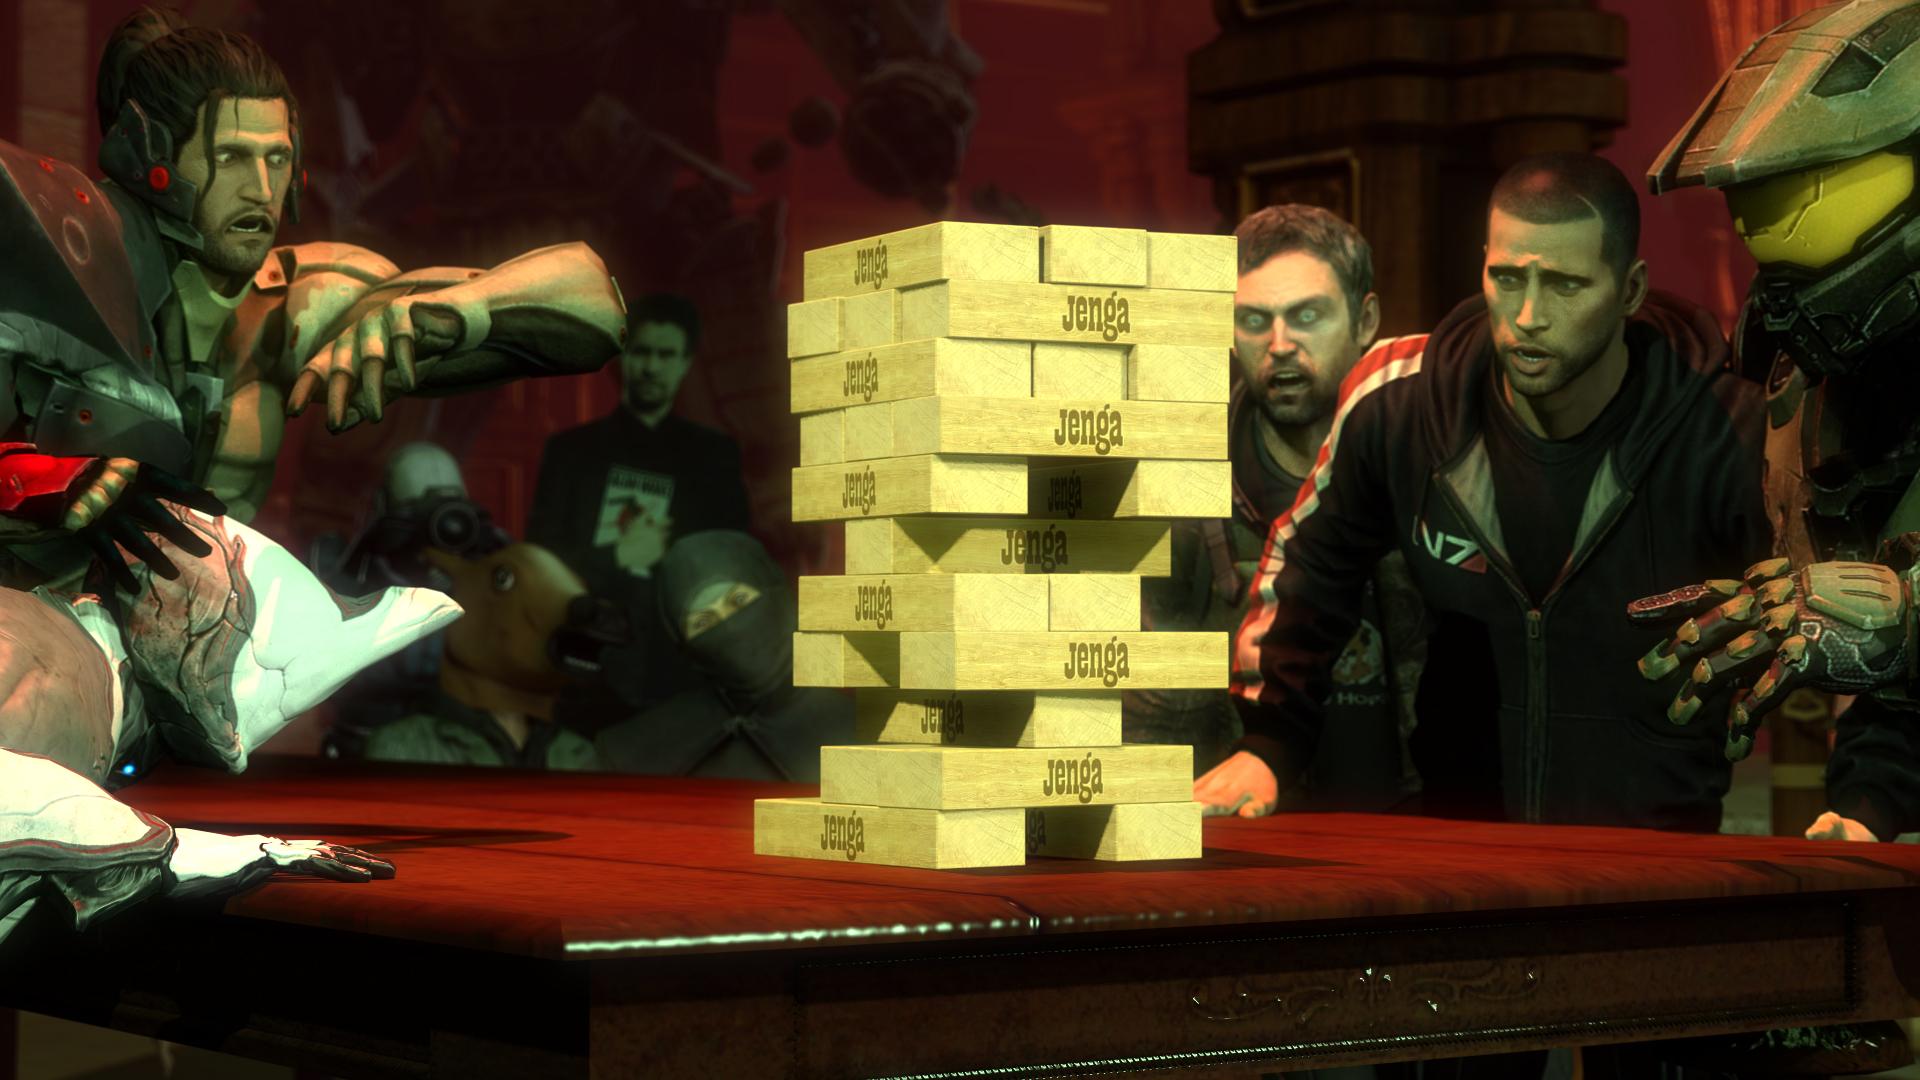 Wallpaper : video games, Mass Effect, Halo, Metal Gear Rising ...